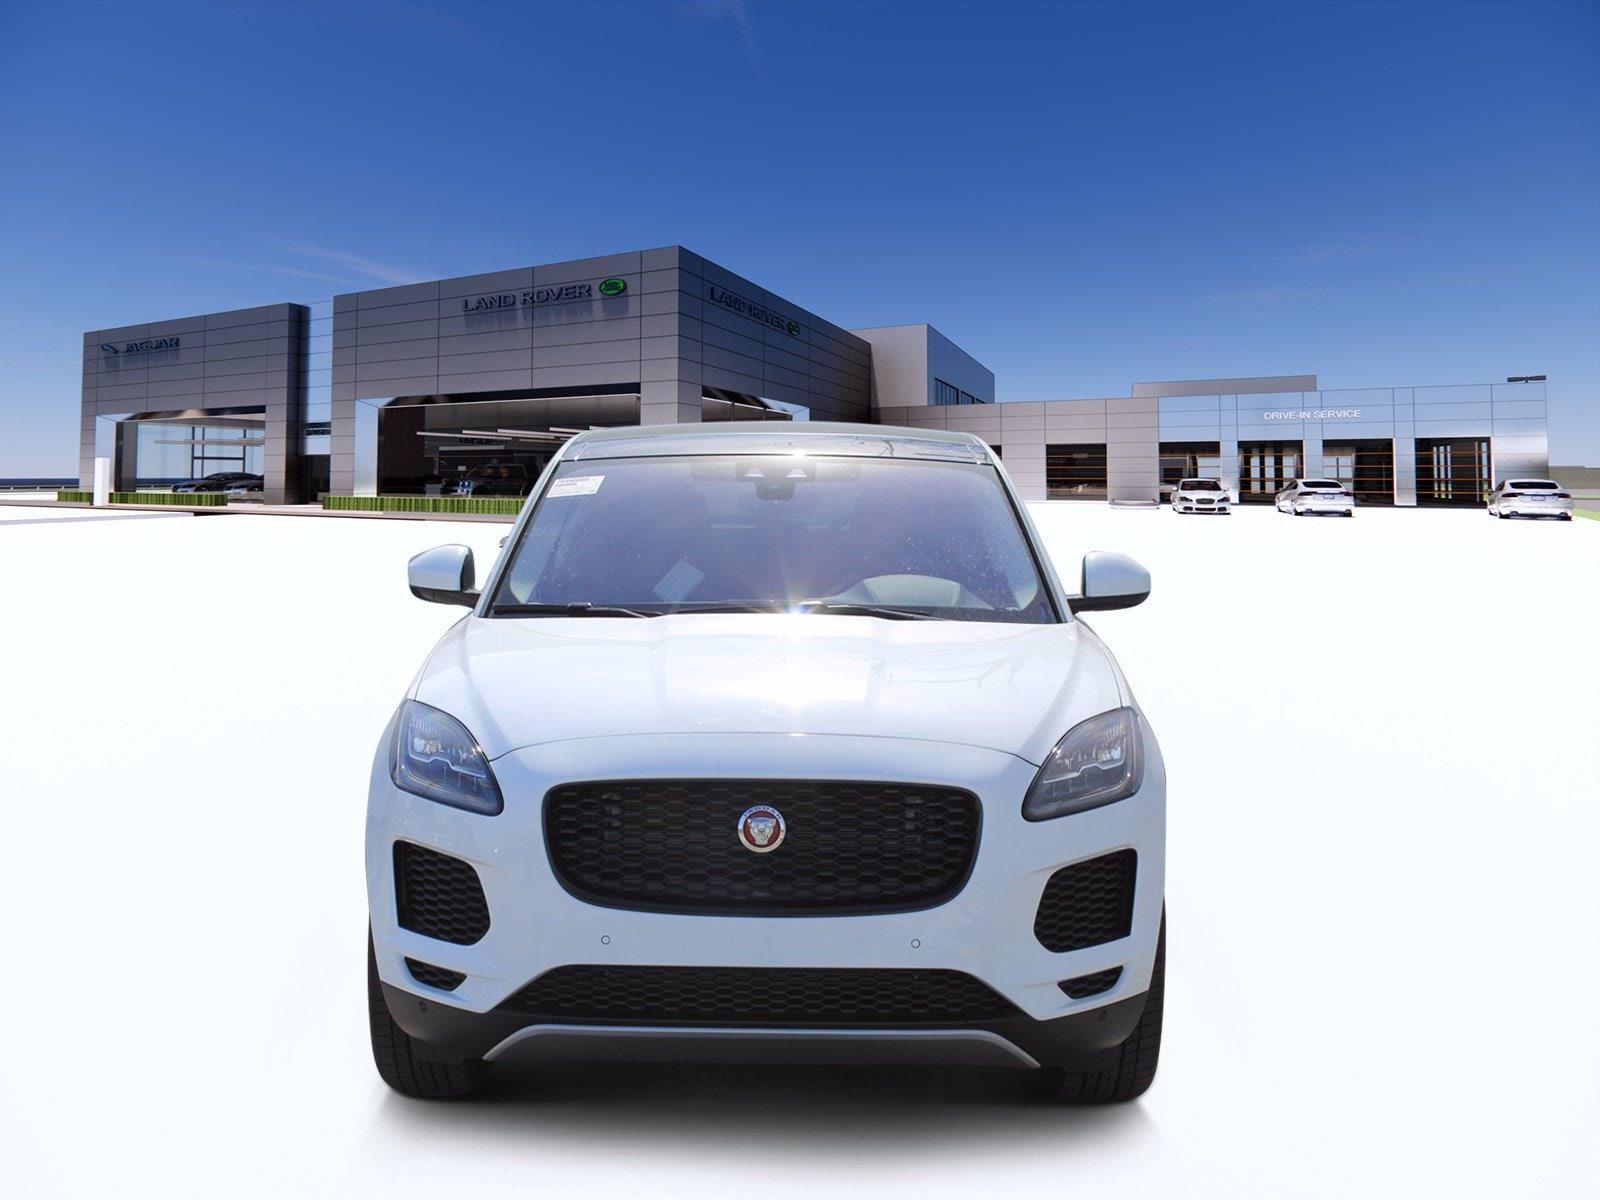 car-gallery-8